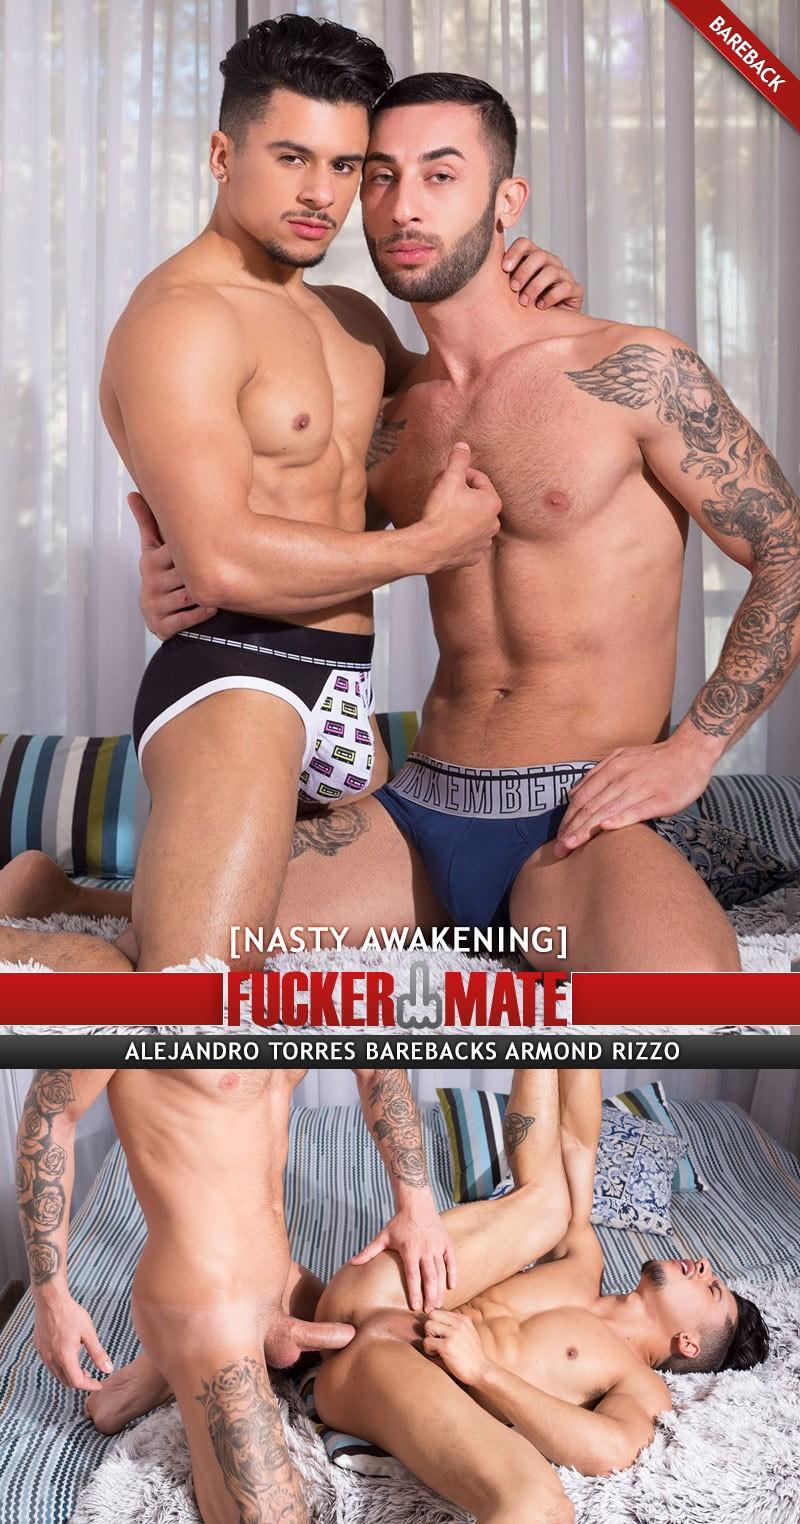 Fuckermate - Alejandro Torres and Armond Rizzo - Nasty Awakening